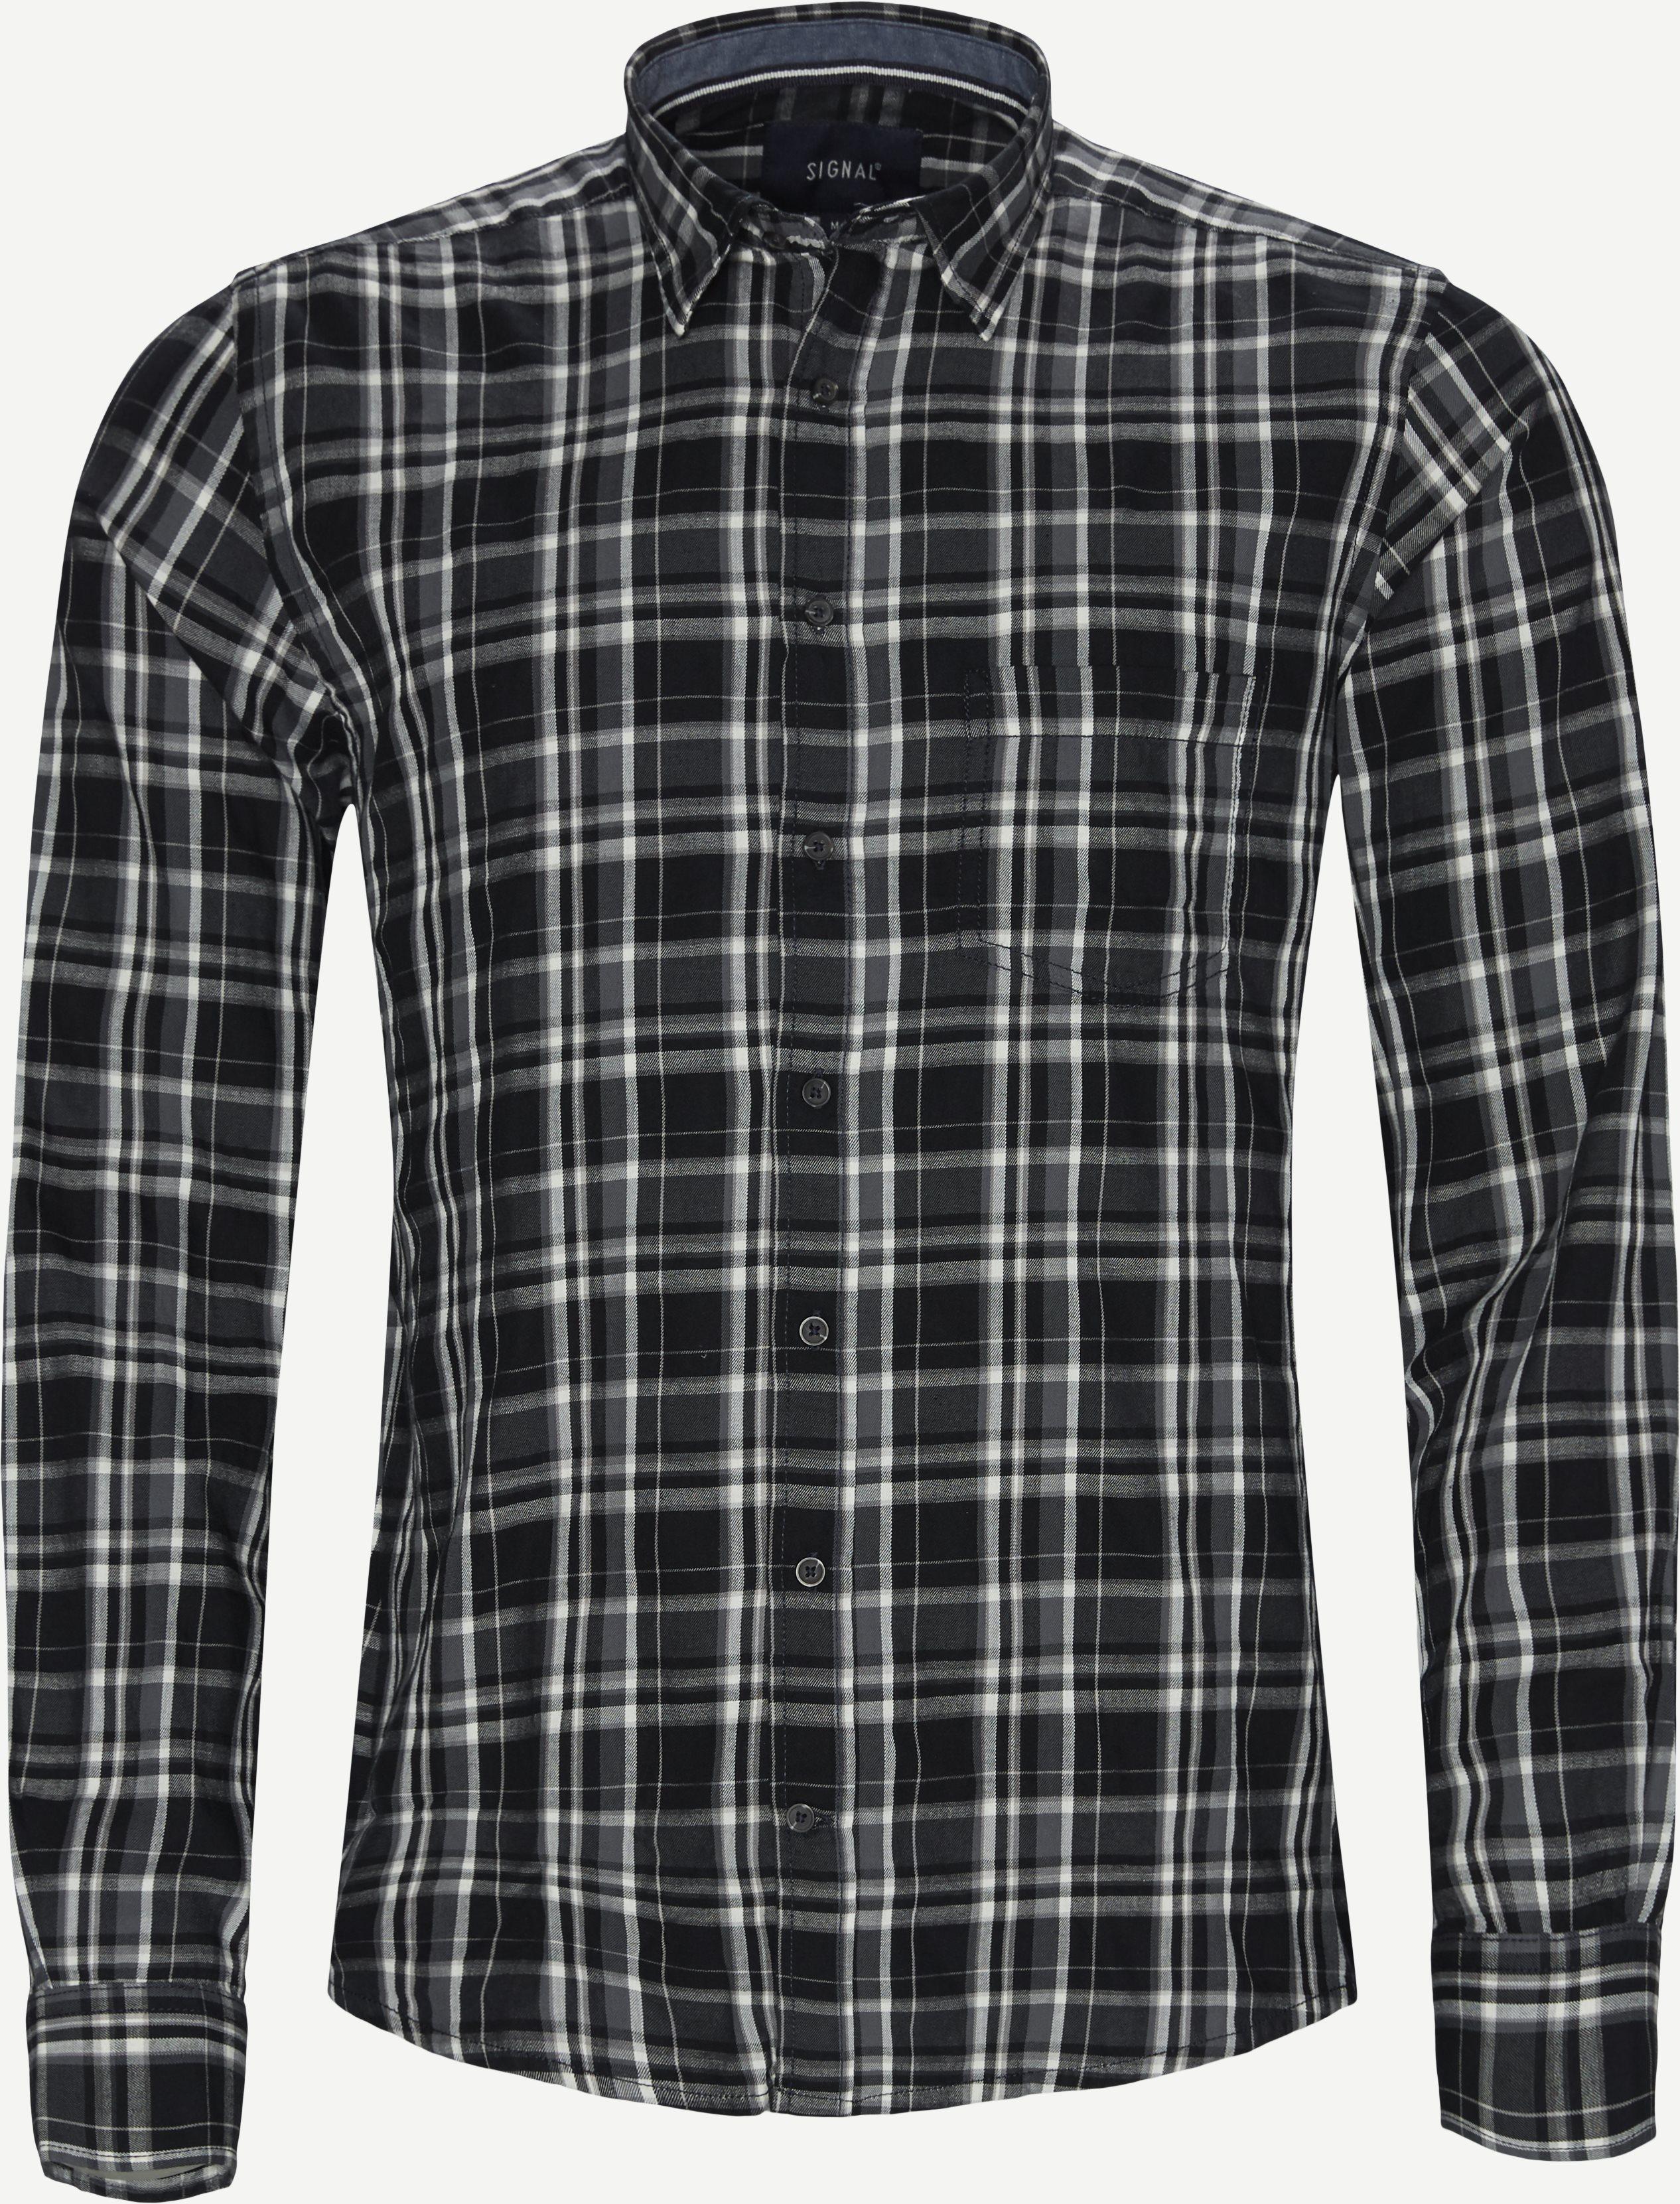 Shirts - Regular - Grey